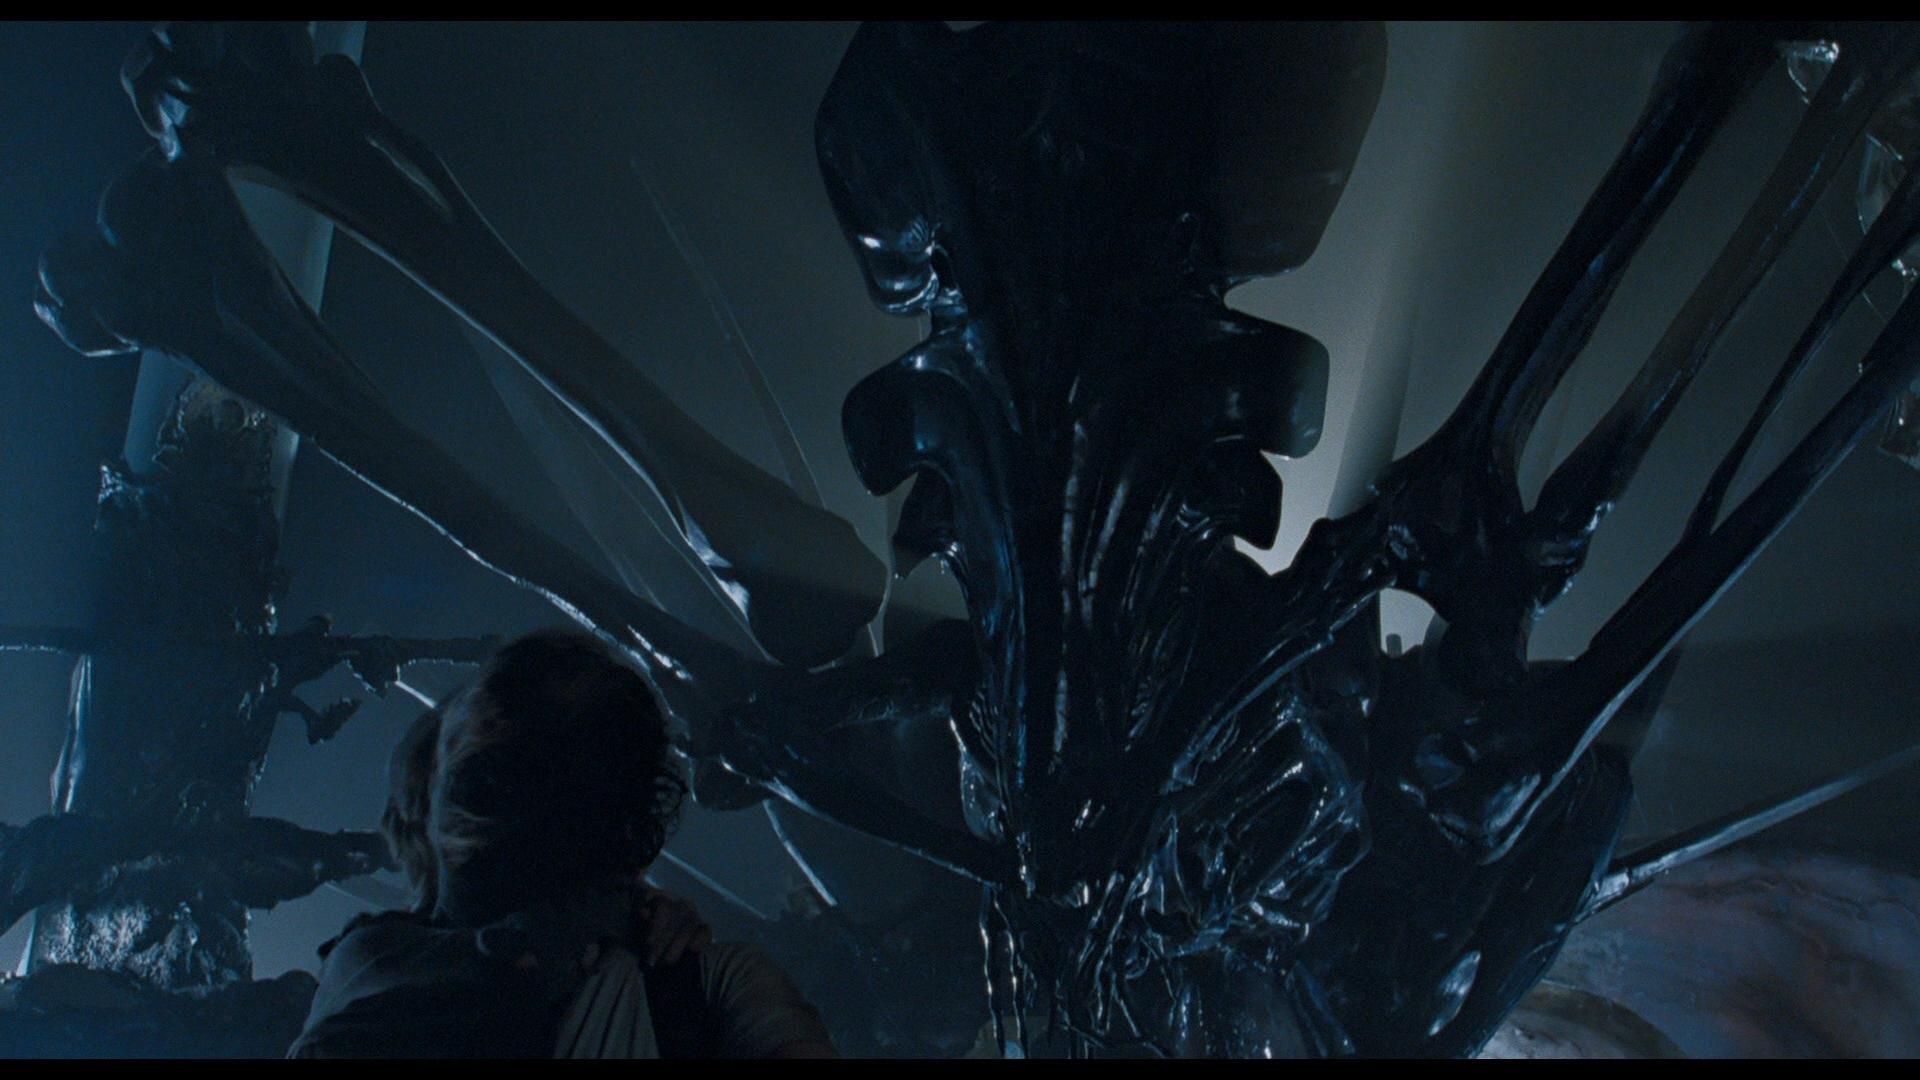 ALIENS (1986) - Full-size Promotional Alien Queen - Image 37 of 38